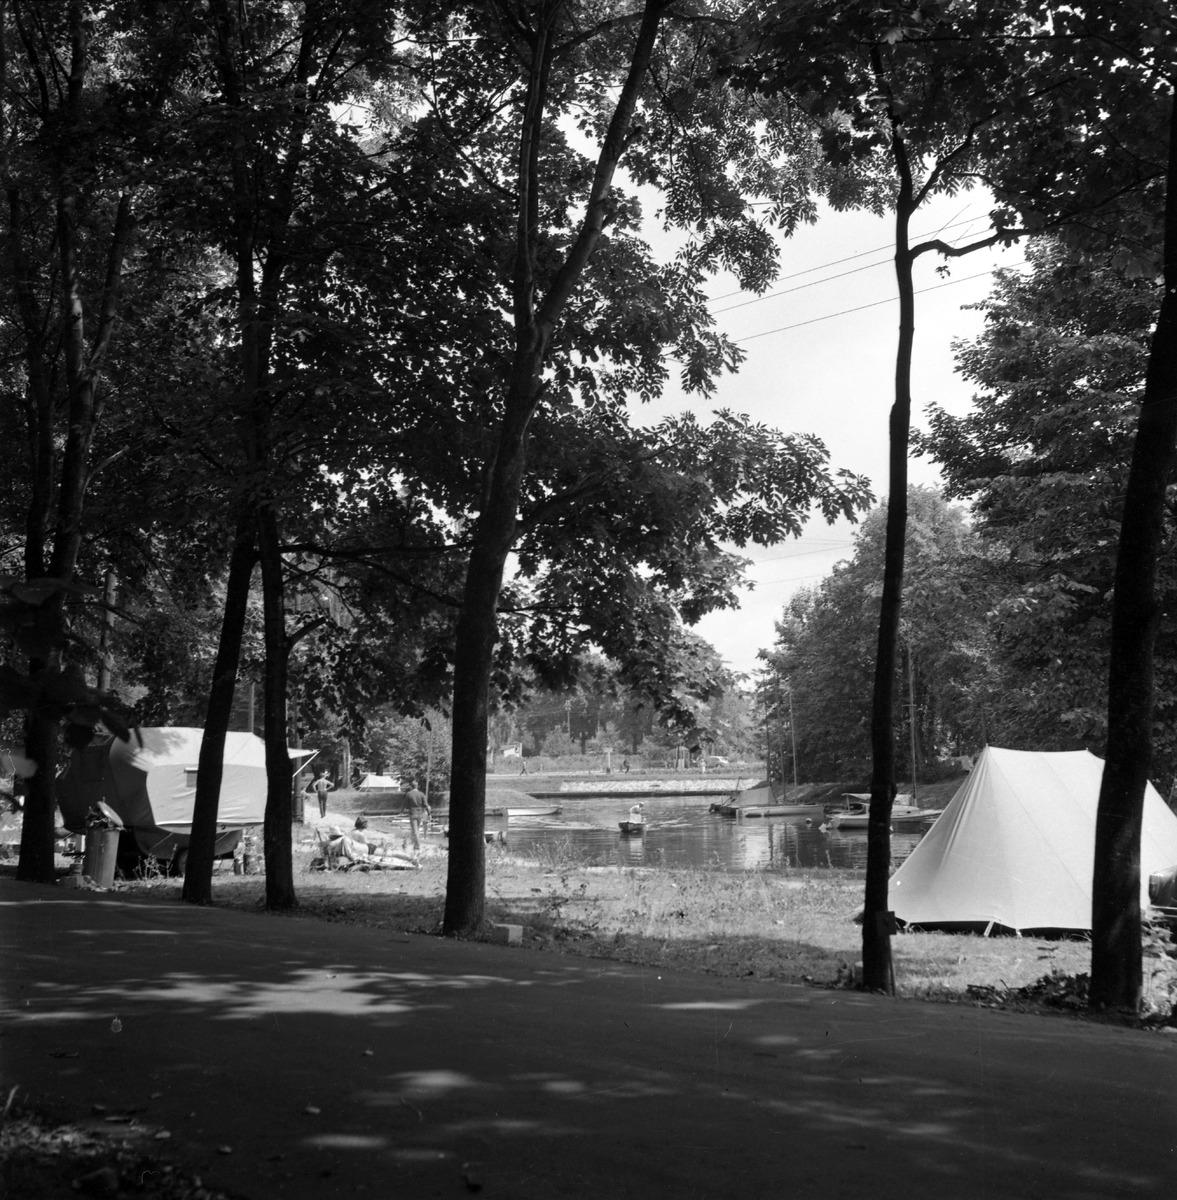 Camping przy zamku [7]